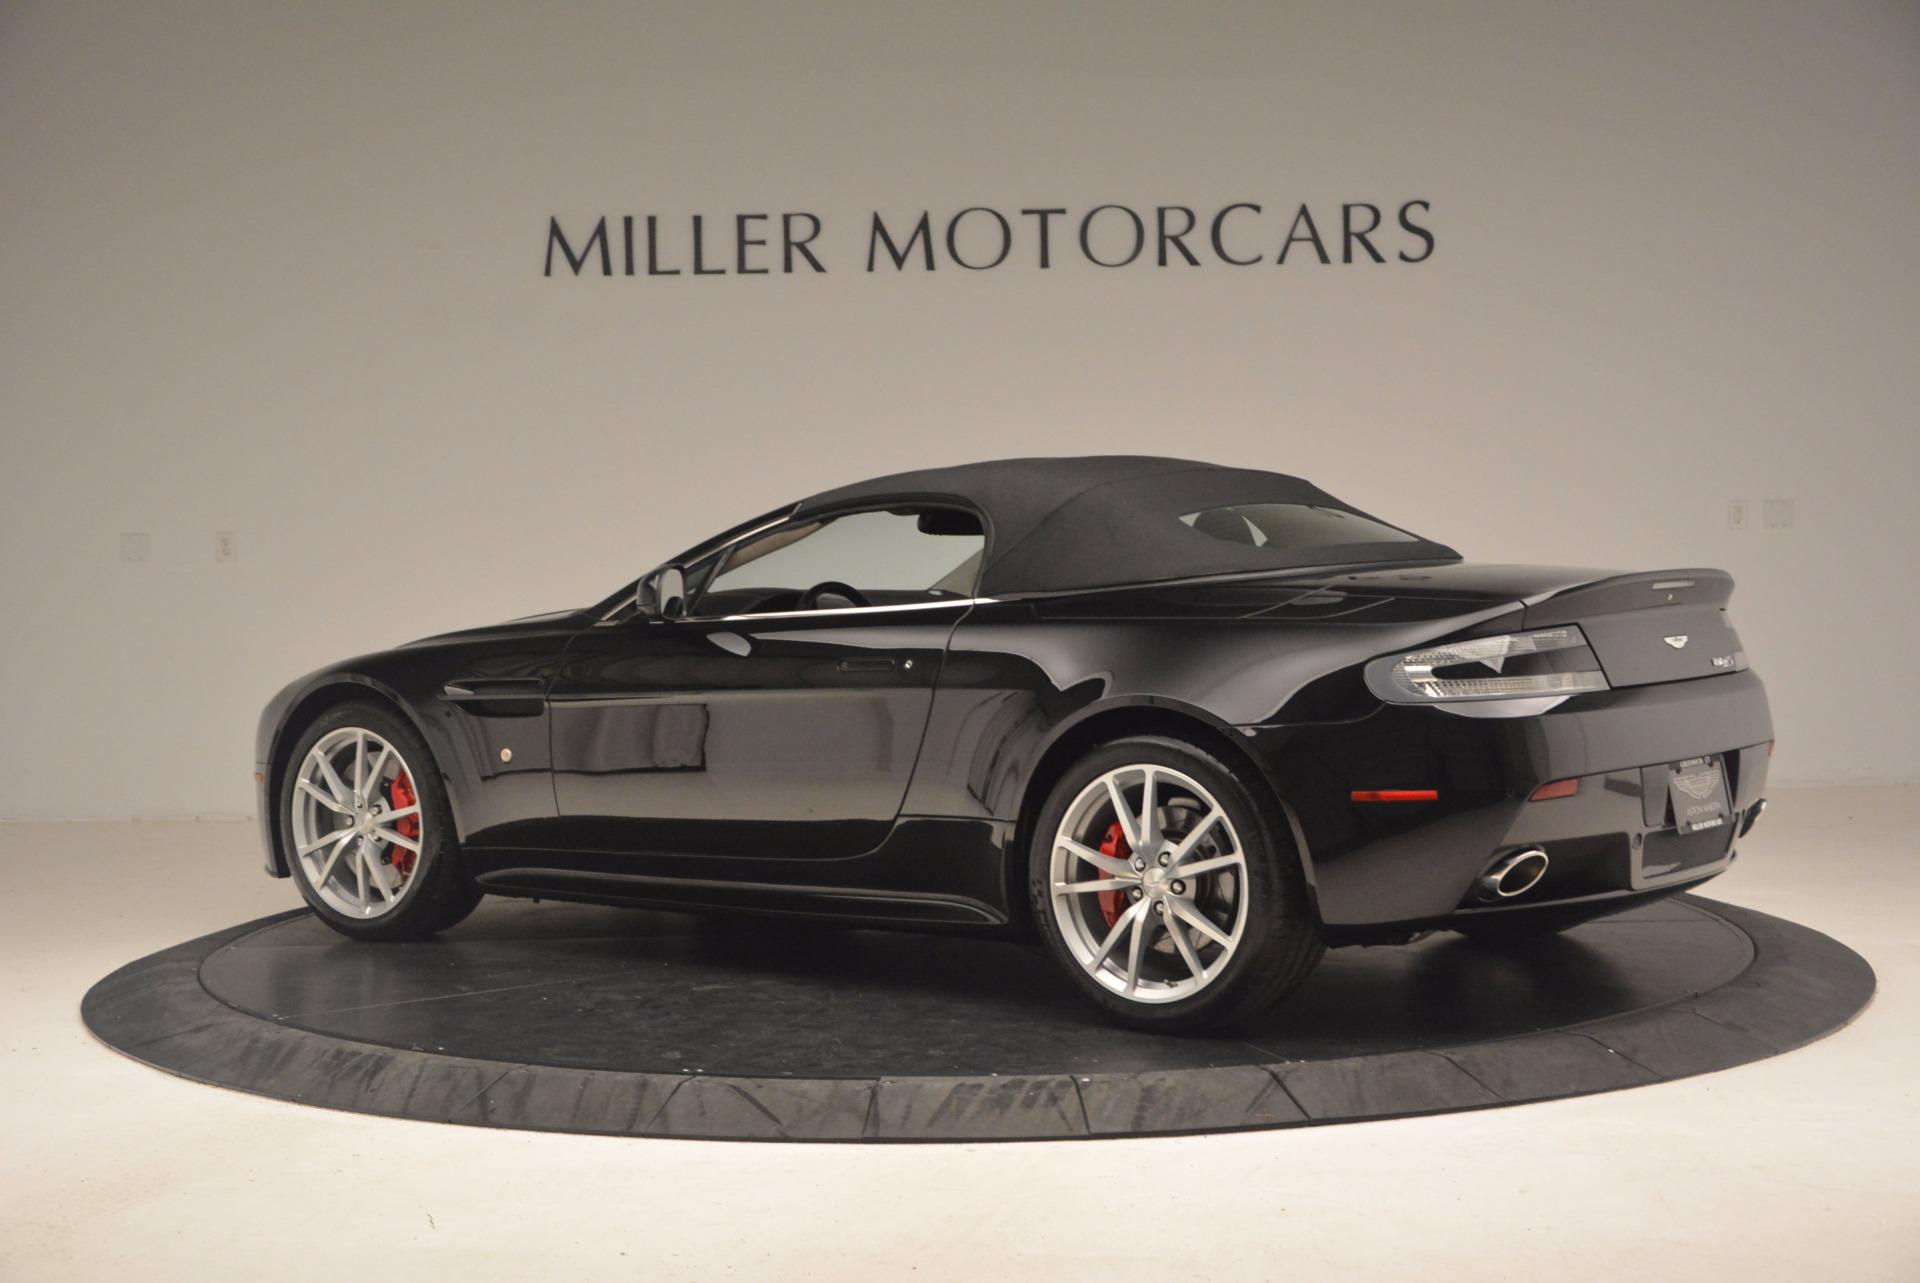 Used 2012 Aston Martin V8 Vantage S Roadster For Sale In Greenwich, CT. Alfa Romeo of Greenwich, 4328A 1181_p16